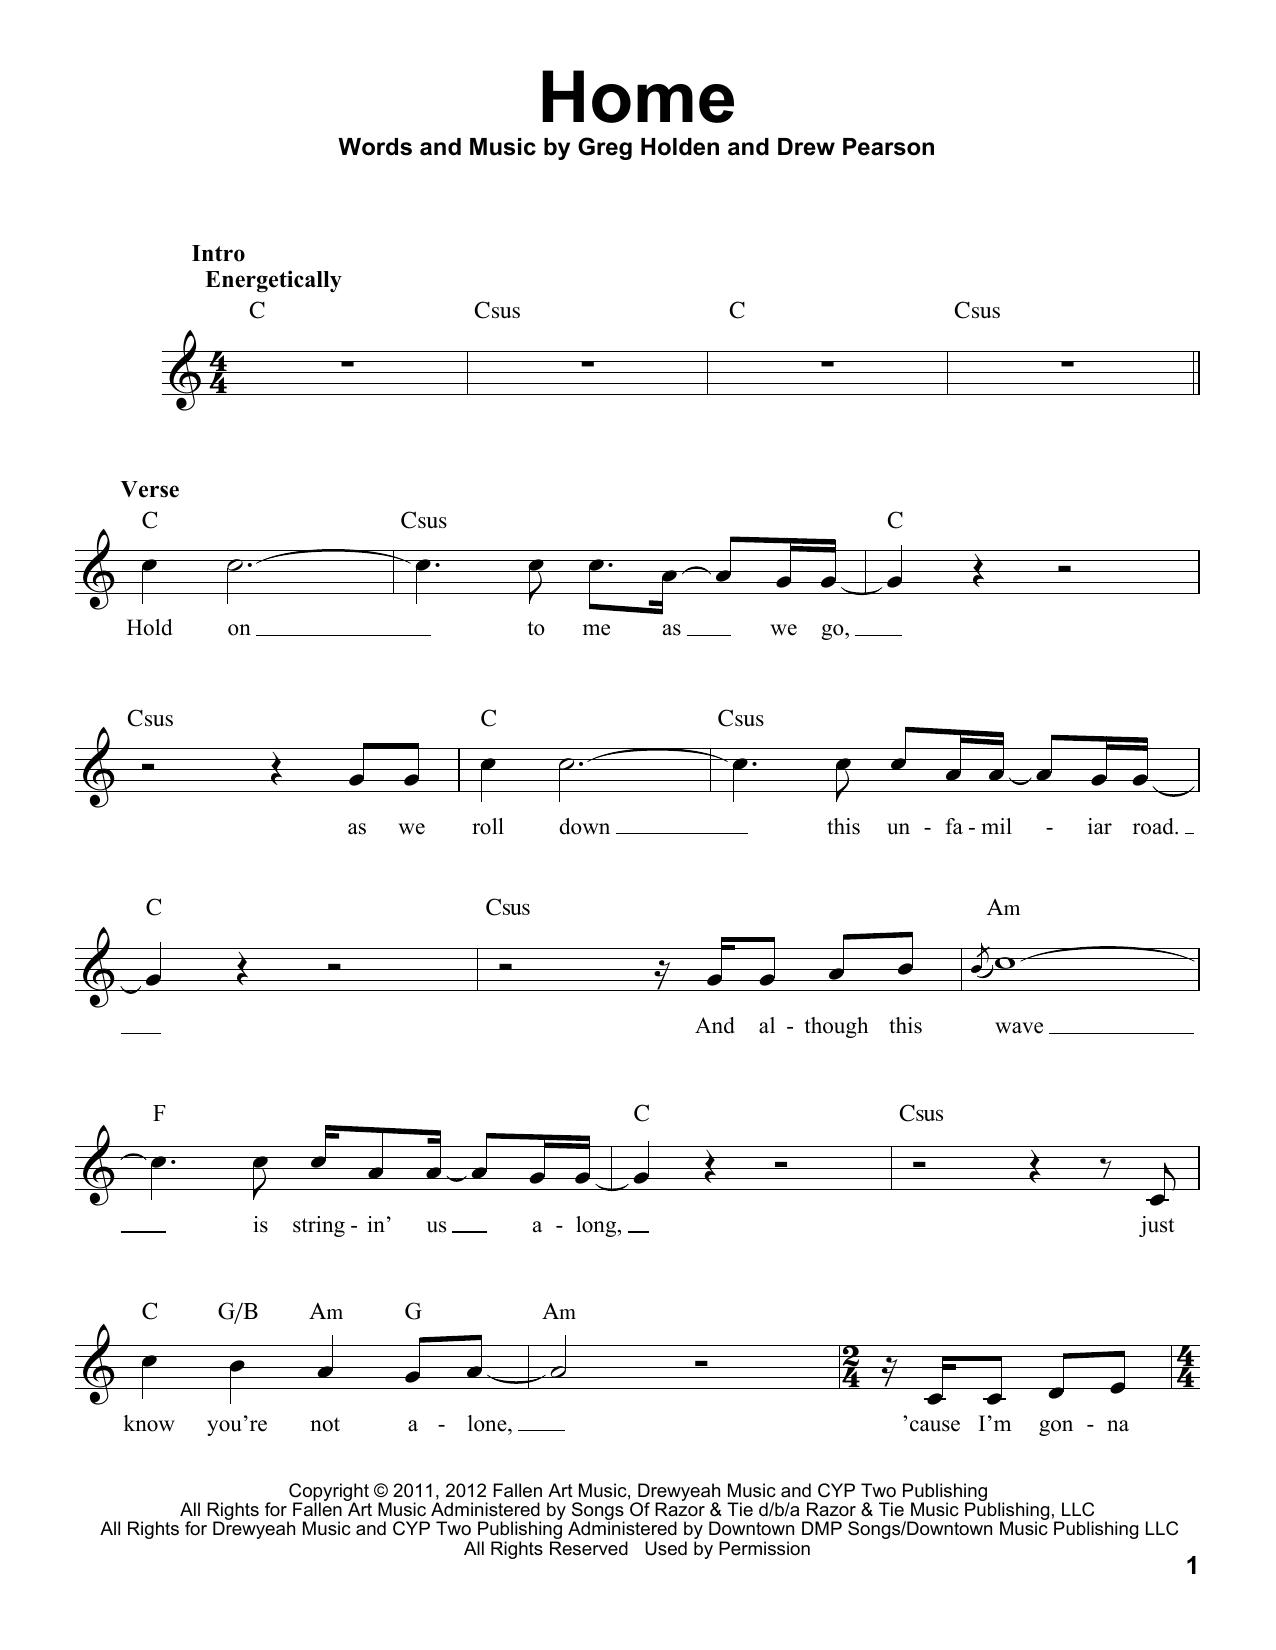 Home Sheet Music